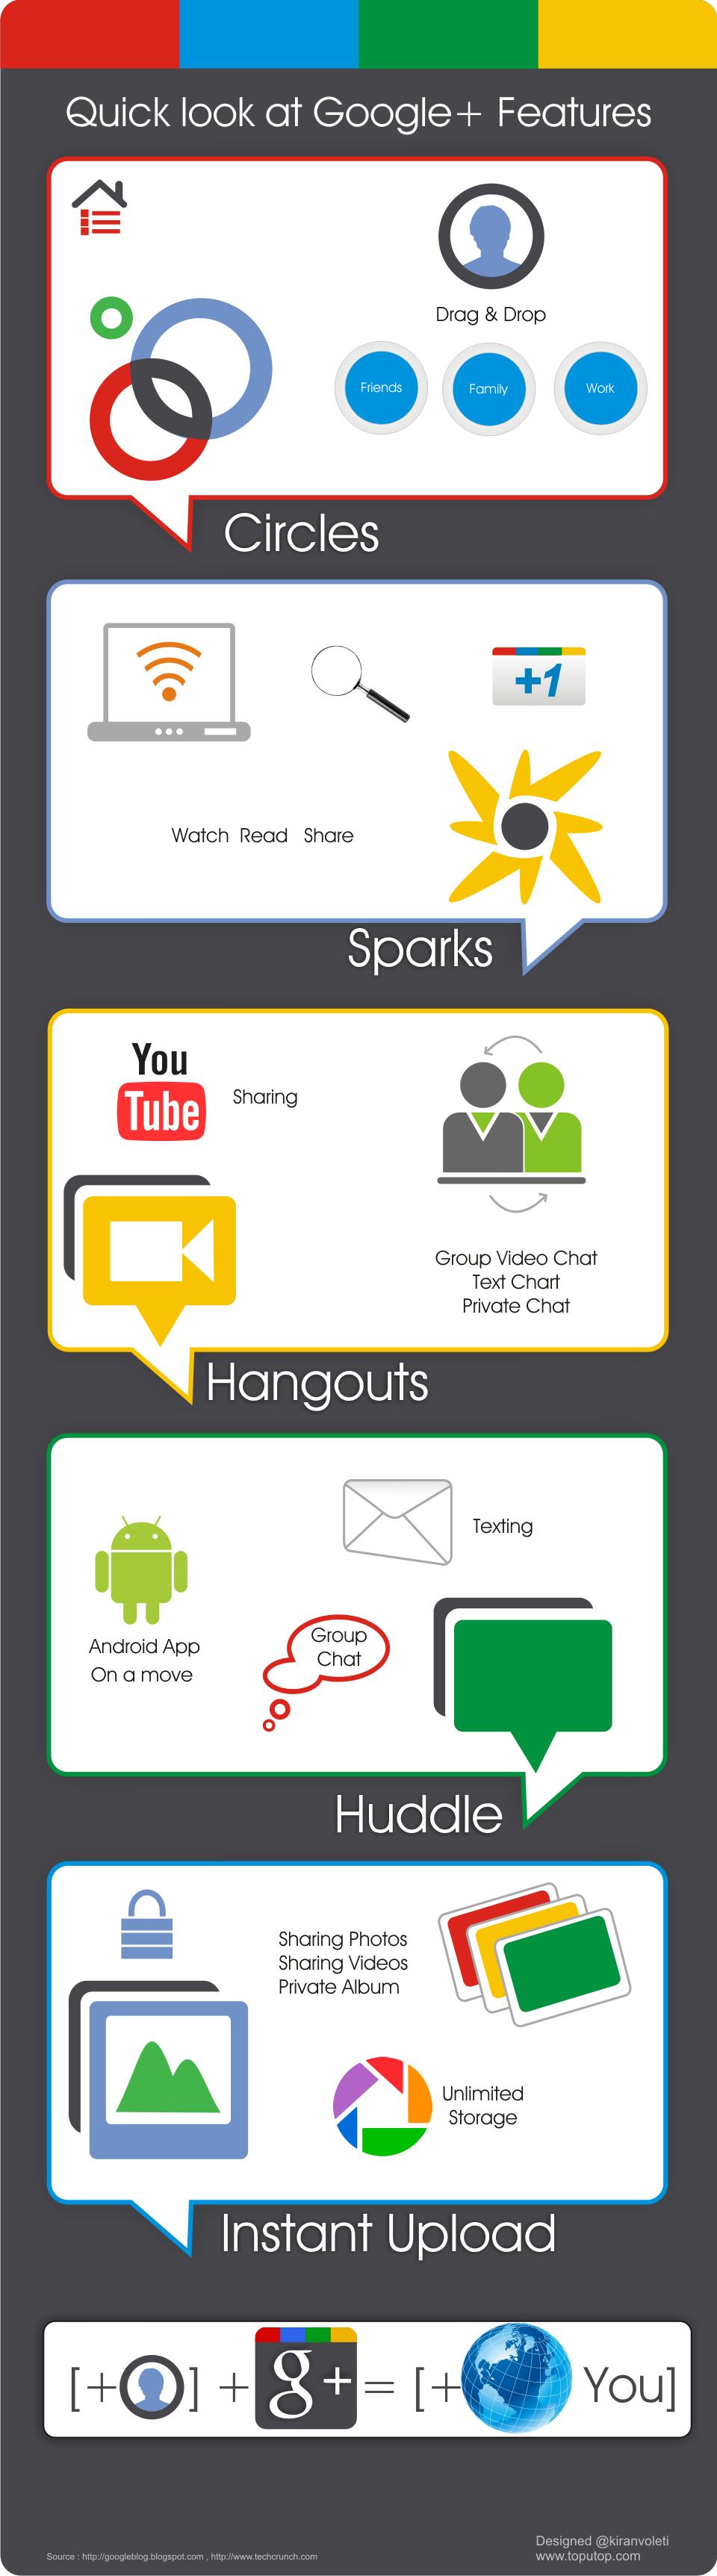 Google+ Basics